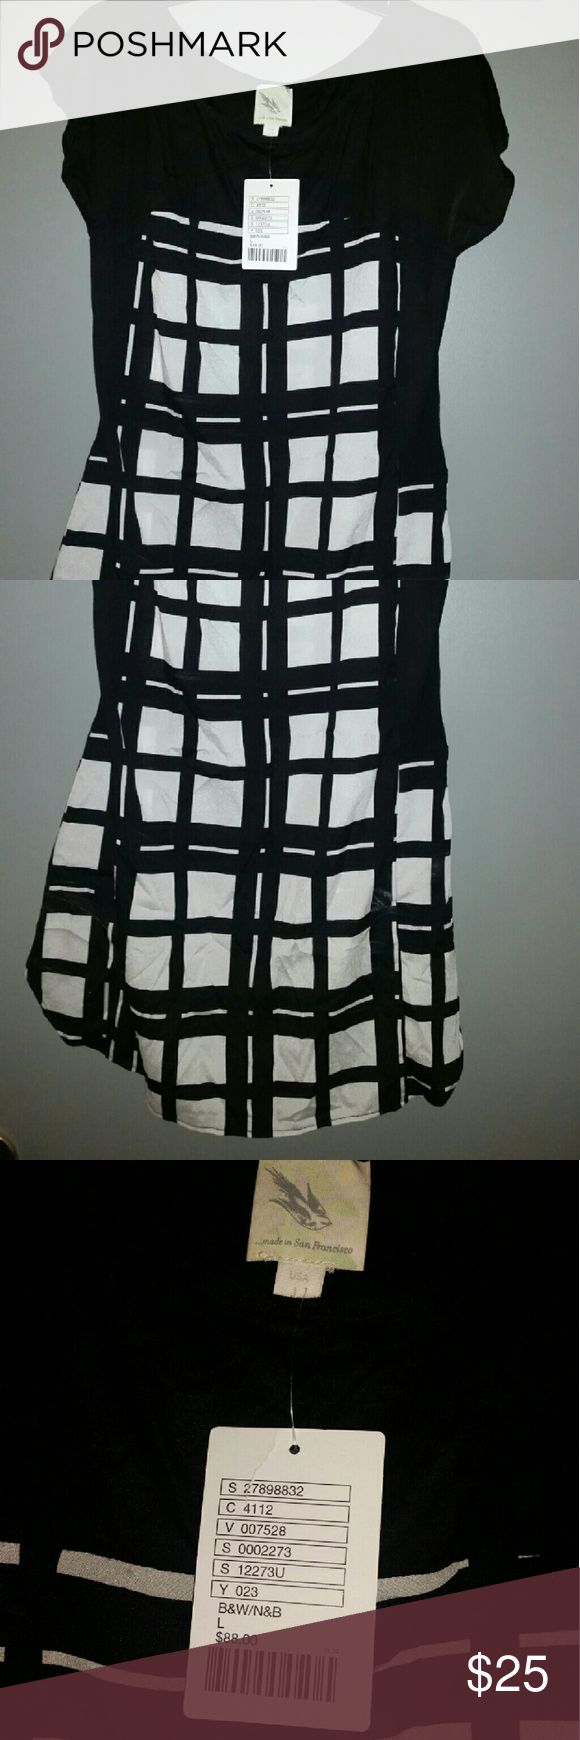 NWT ANTHROPOLOGIE MADE IN SAN FRANCISCO DRESS  L Dress or top large anthropologie Anthropologie Dresses Mini